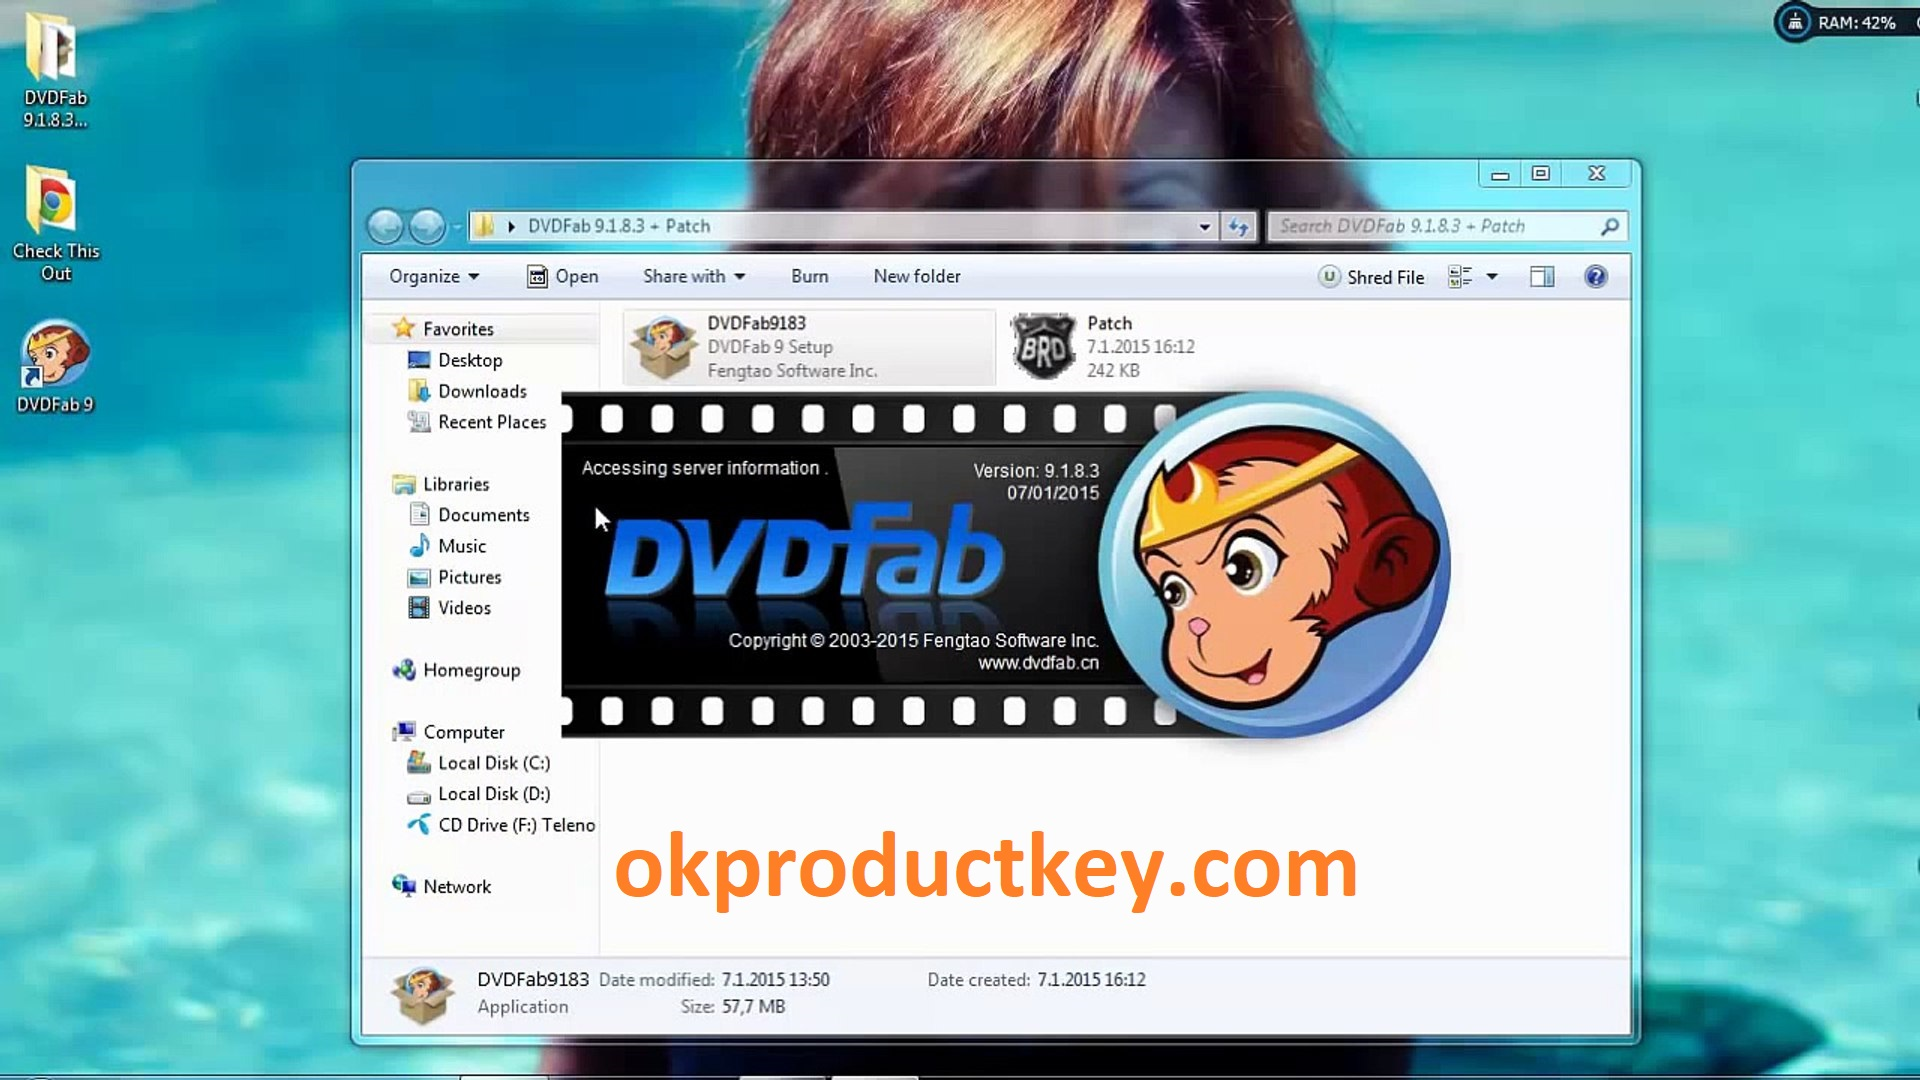 DVDFab 12.0.1.3 Crack + Keygen Full Version Free Download 2021